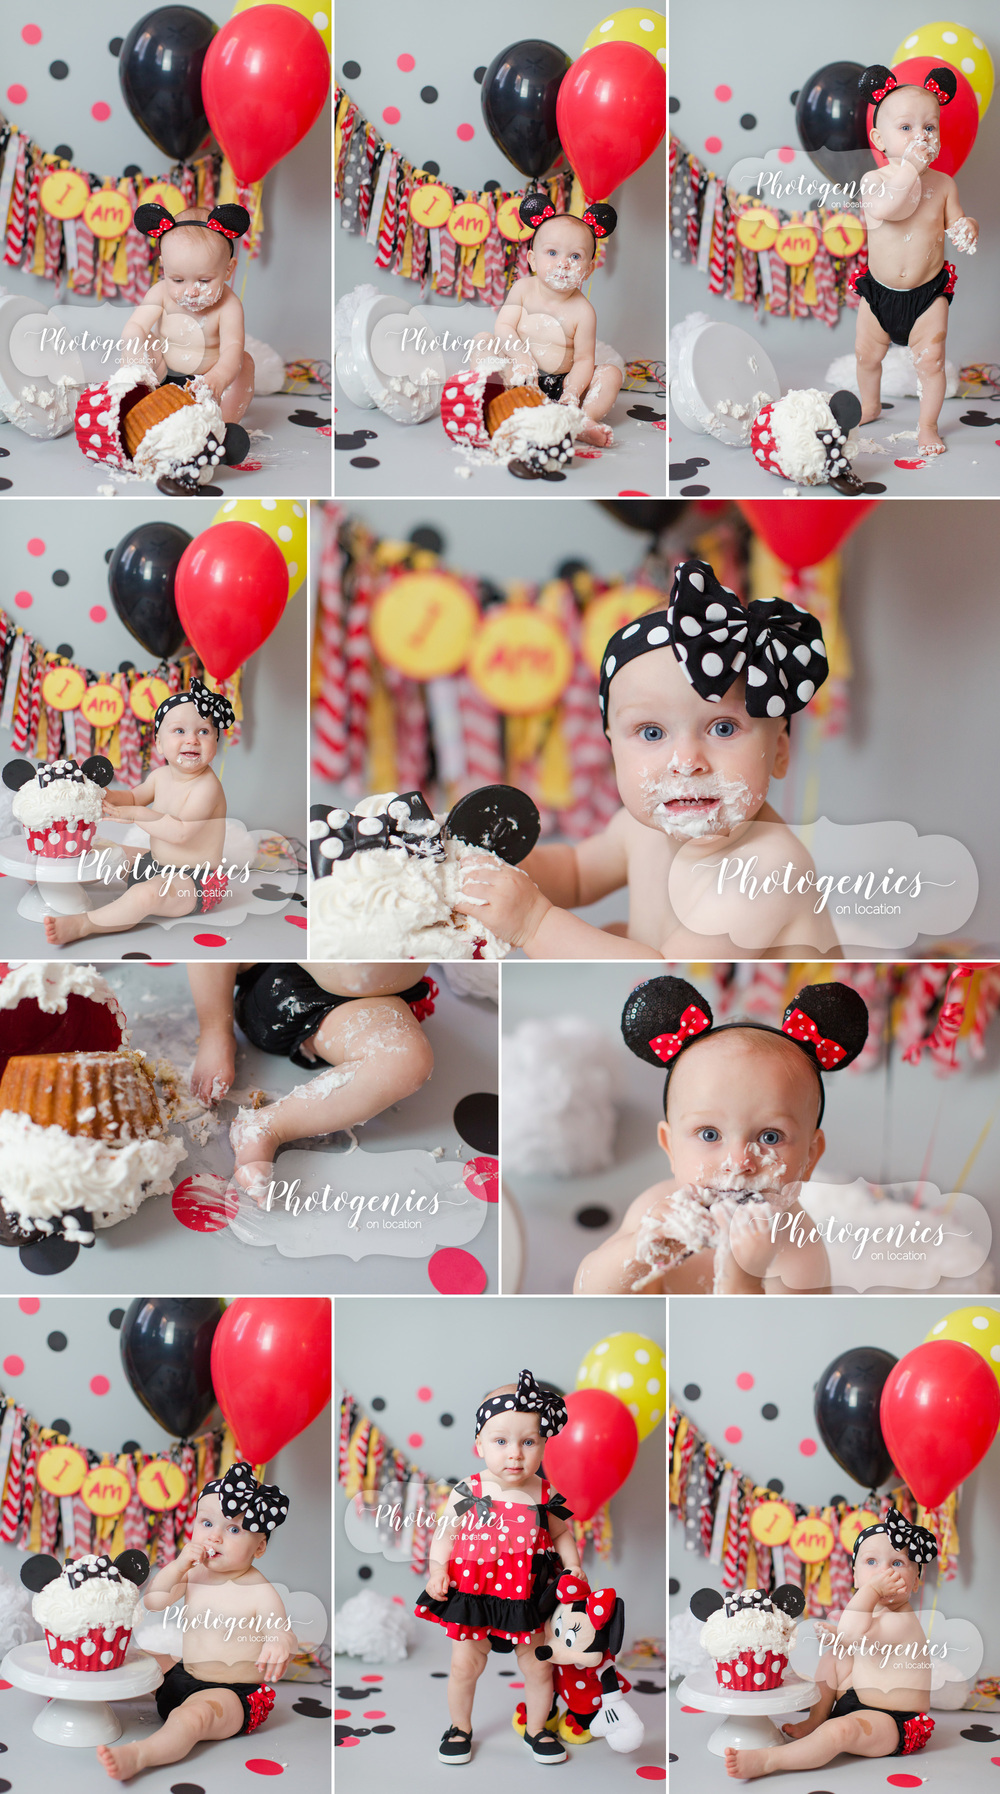 birthday_first_photography_ideas_tea_party_theme_minnie_mouse_cake_smash 3.jpg